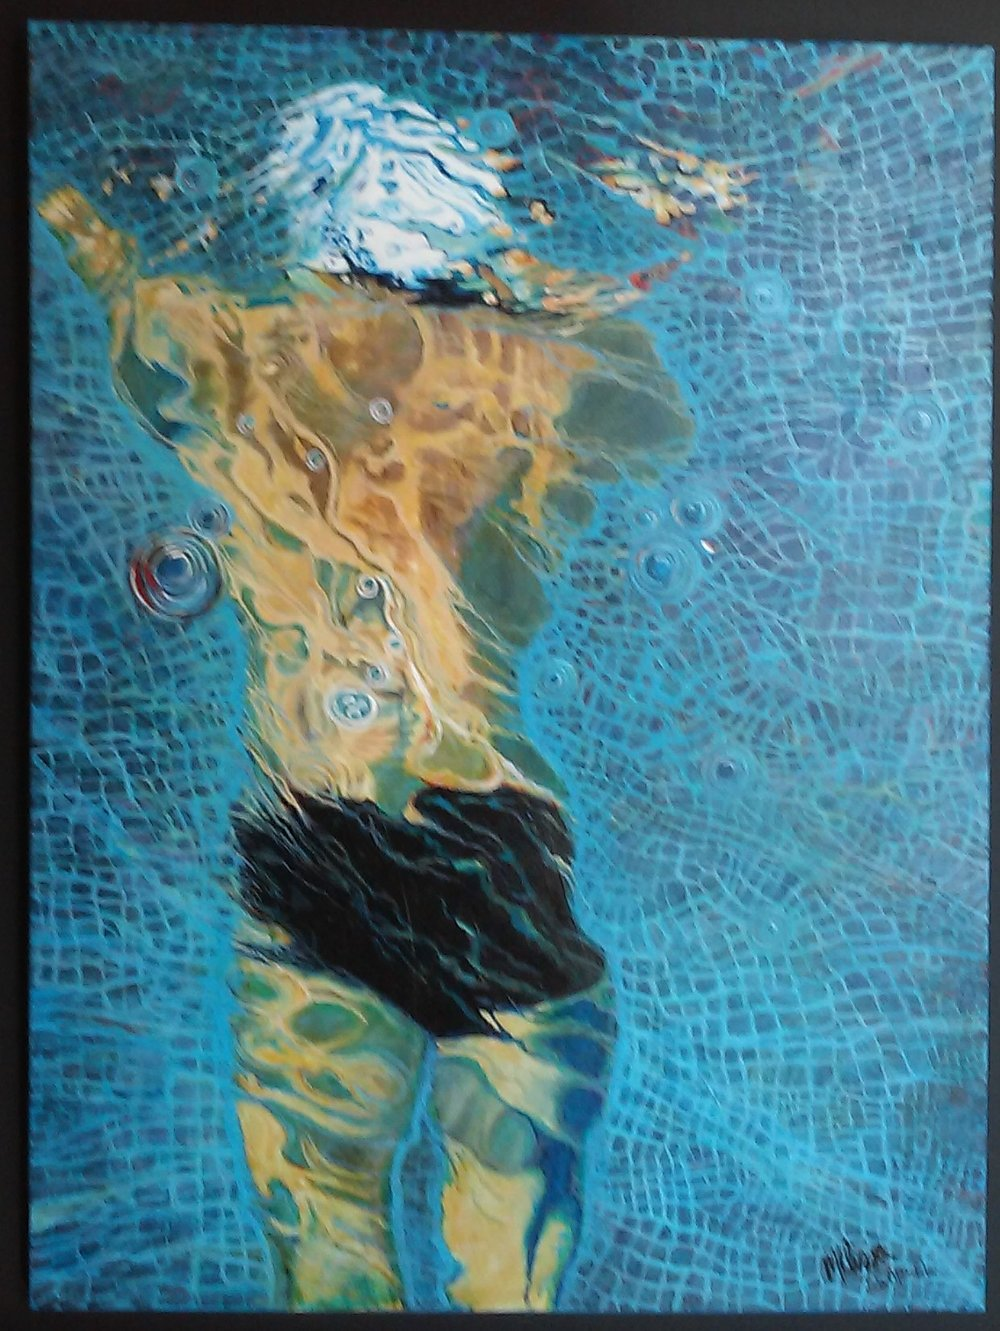 Freestyle by Melissa Harasz